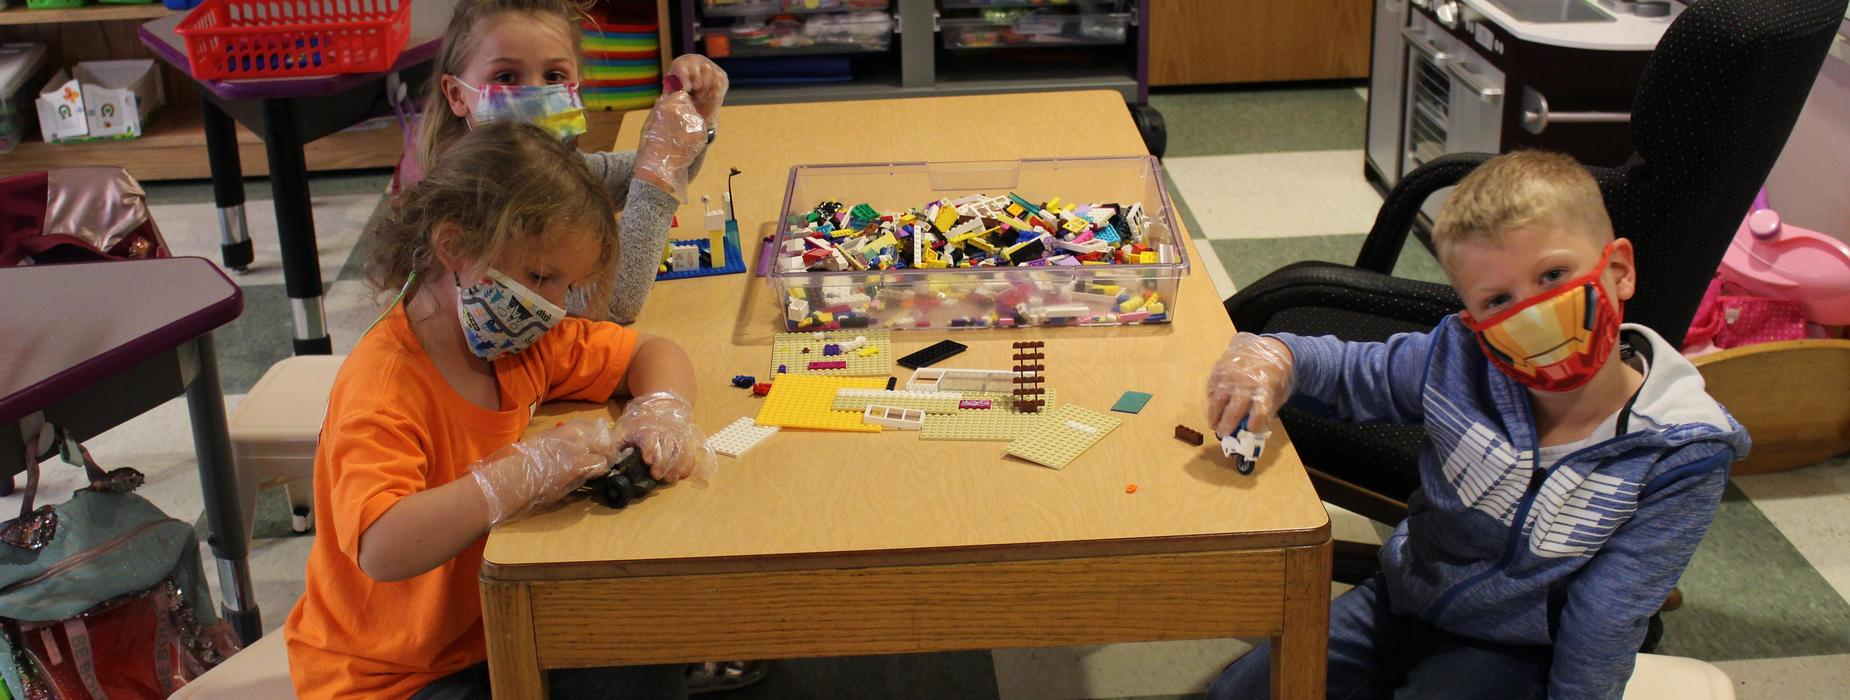 PreK students playing during recess